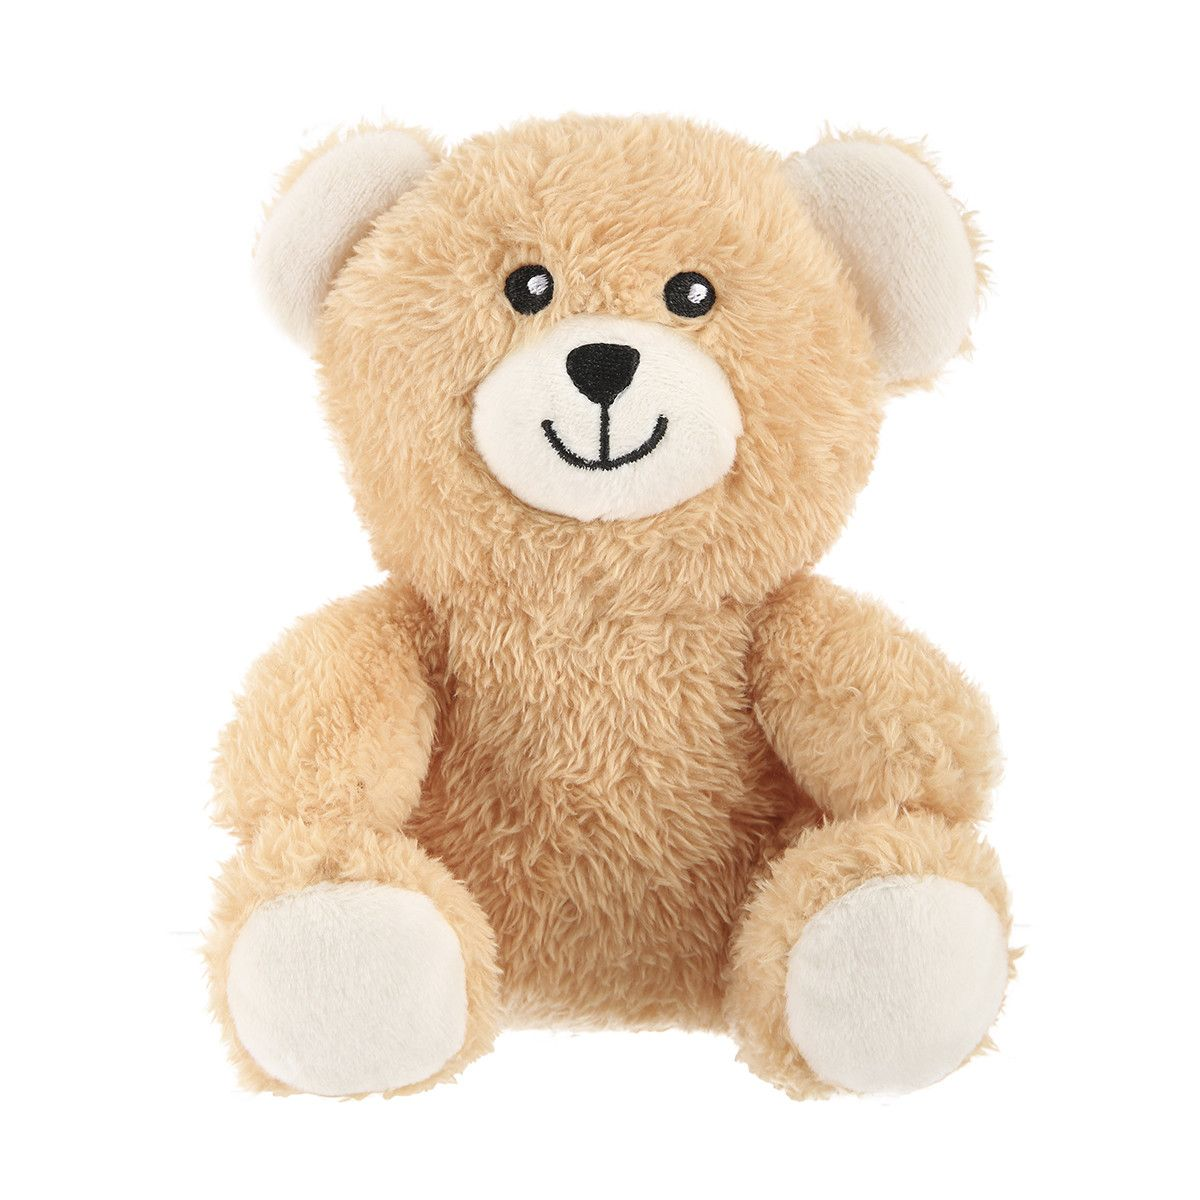 Plush Bear Puppy Toy Kmart Bear Puppy Toy Puppies Puppy Plush Toys [ 1200 x 1200 Pixel ]